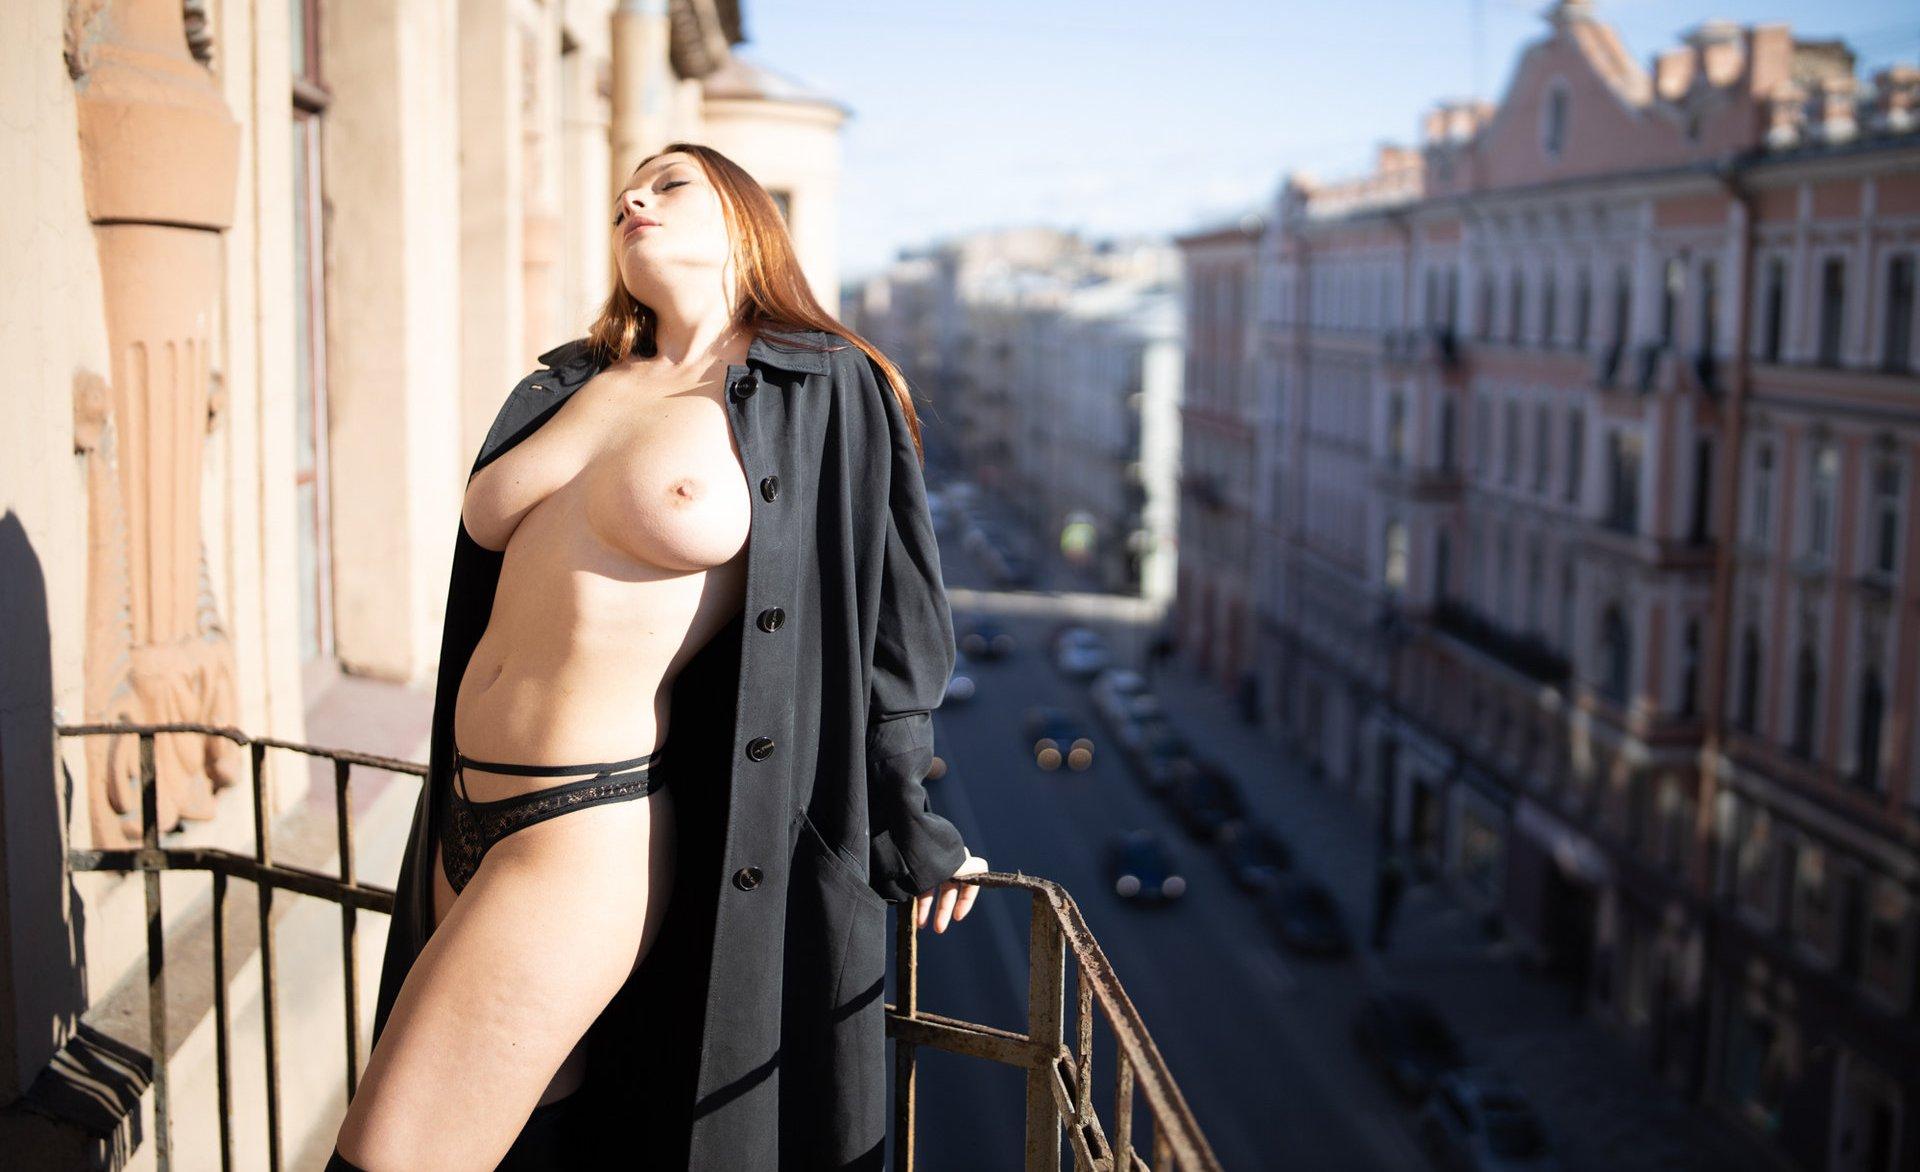 Olga Kobzar Bugs Bunny Gf Nudes Leaks 0017